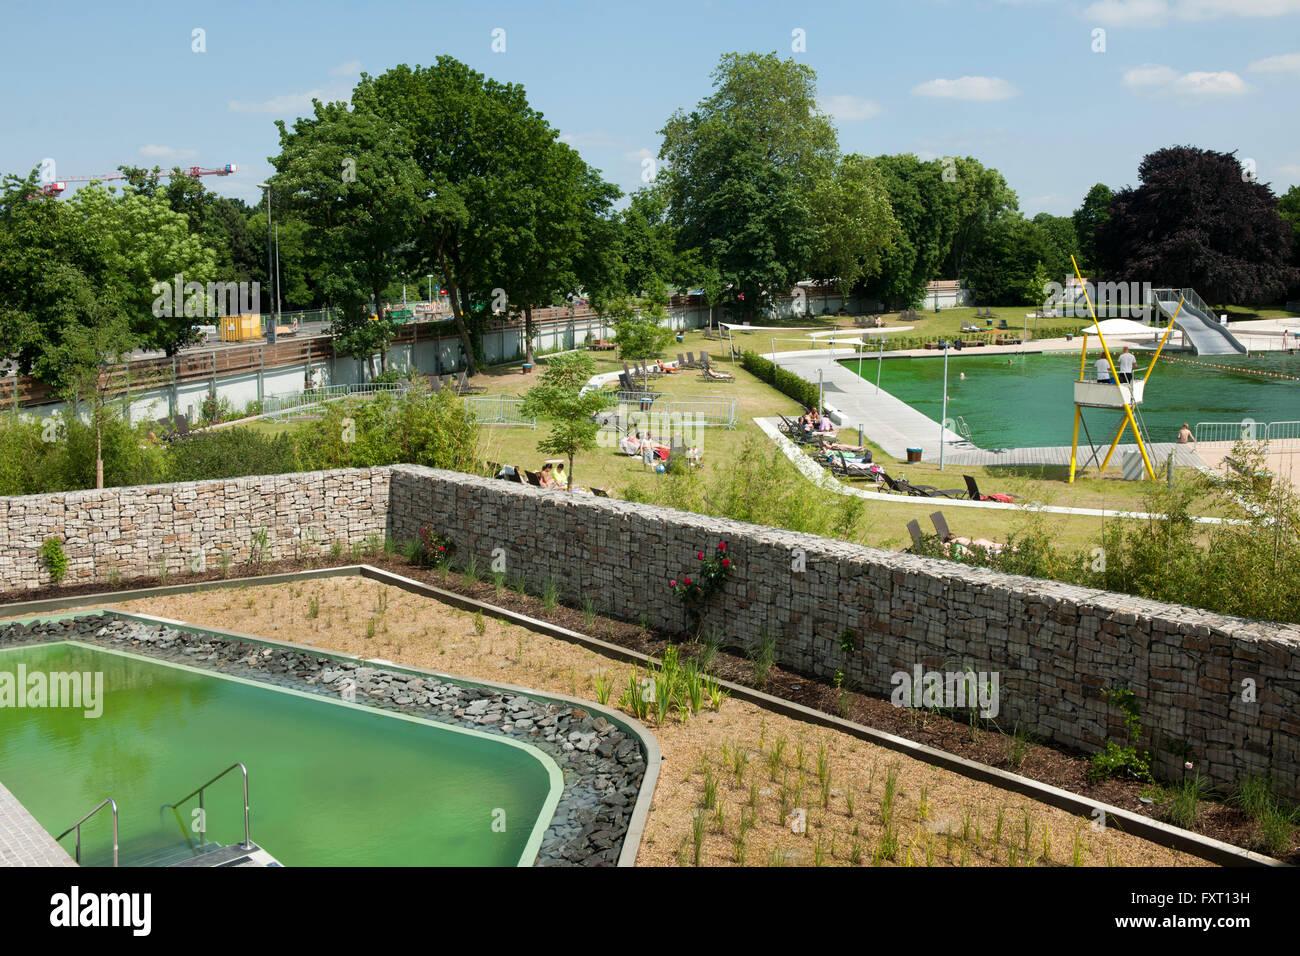 Lentpark Köln Schwimmbad